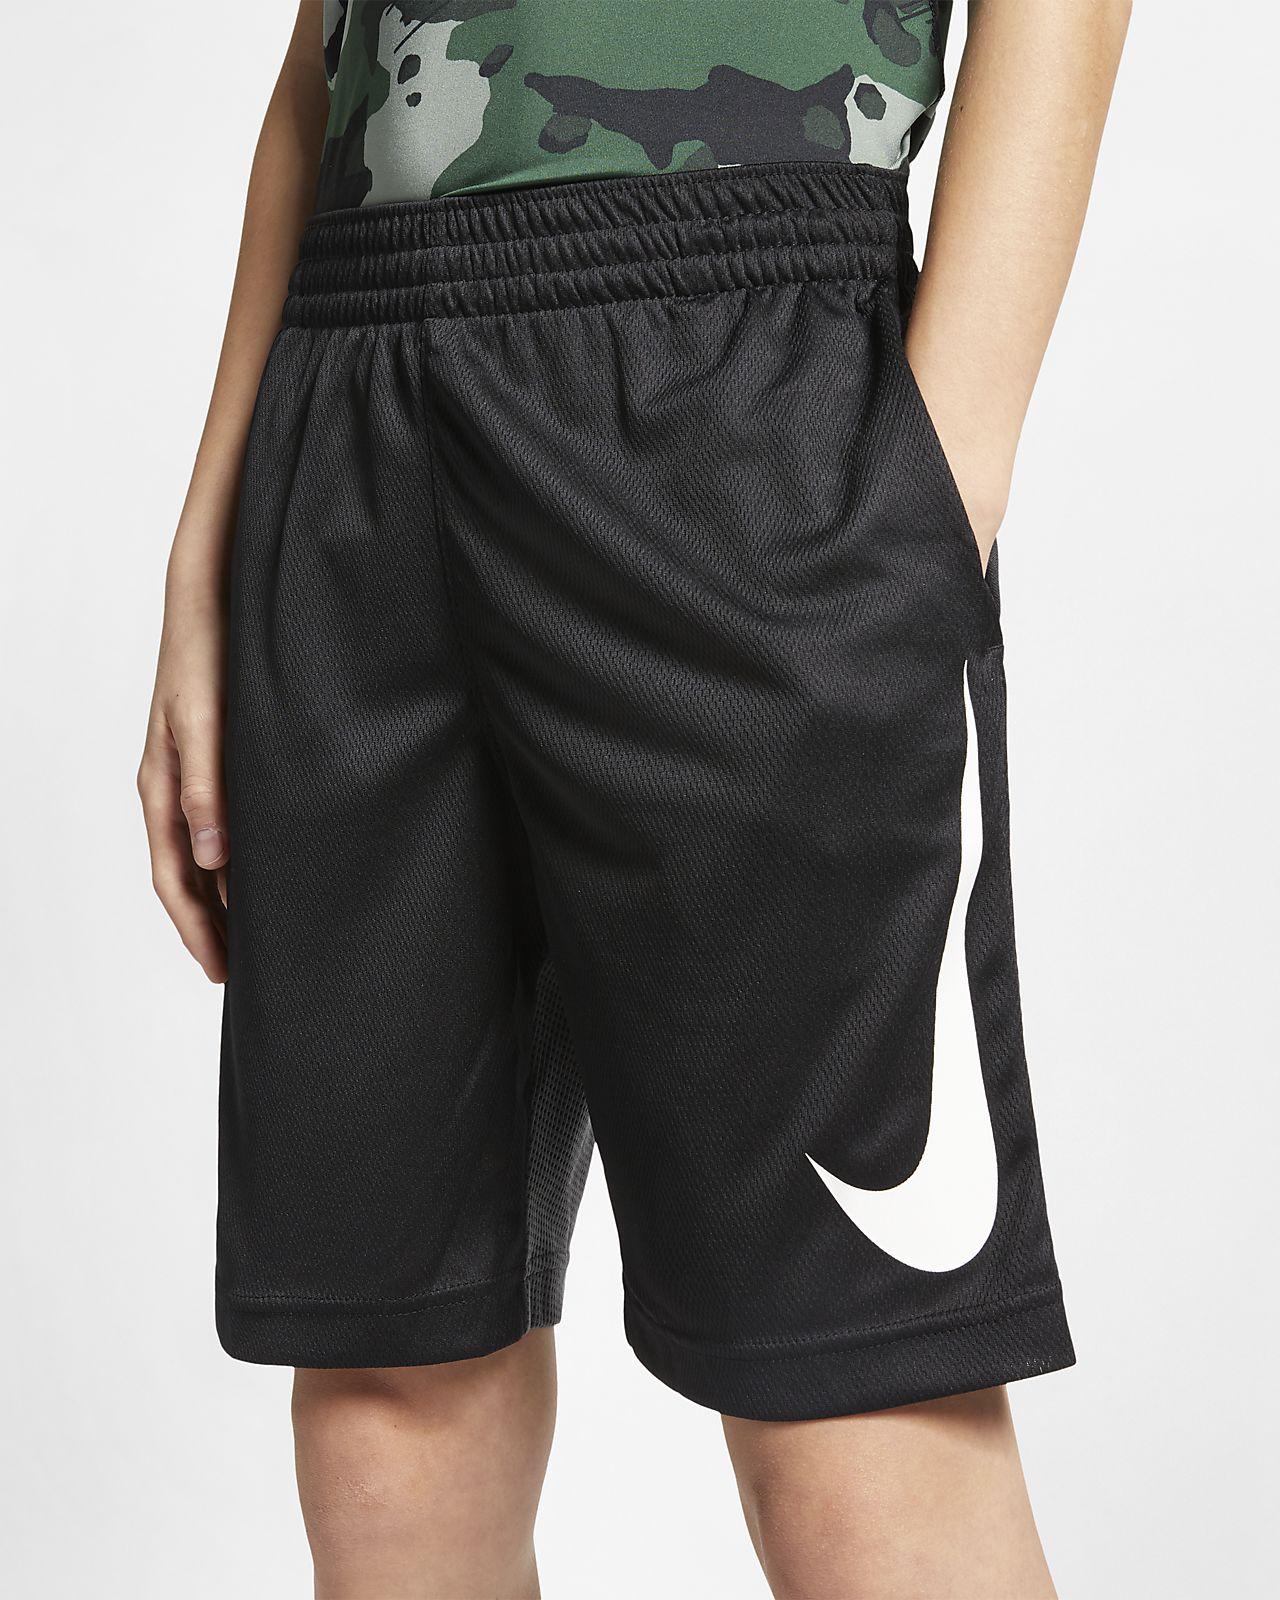 1fa7e181e49 Nike Dri-FIT Pantalón corto de baloncesto - Niño. Nike.com ES